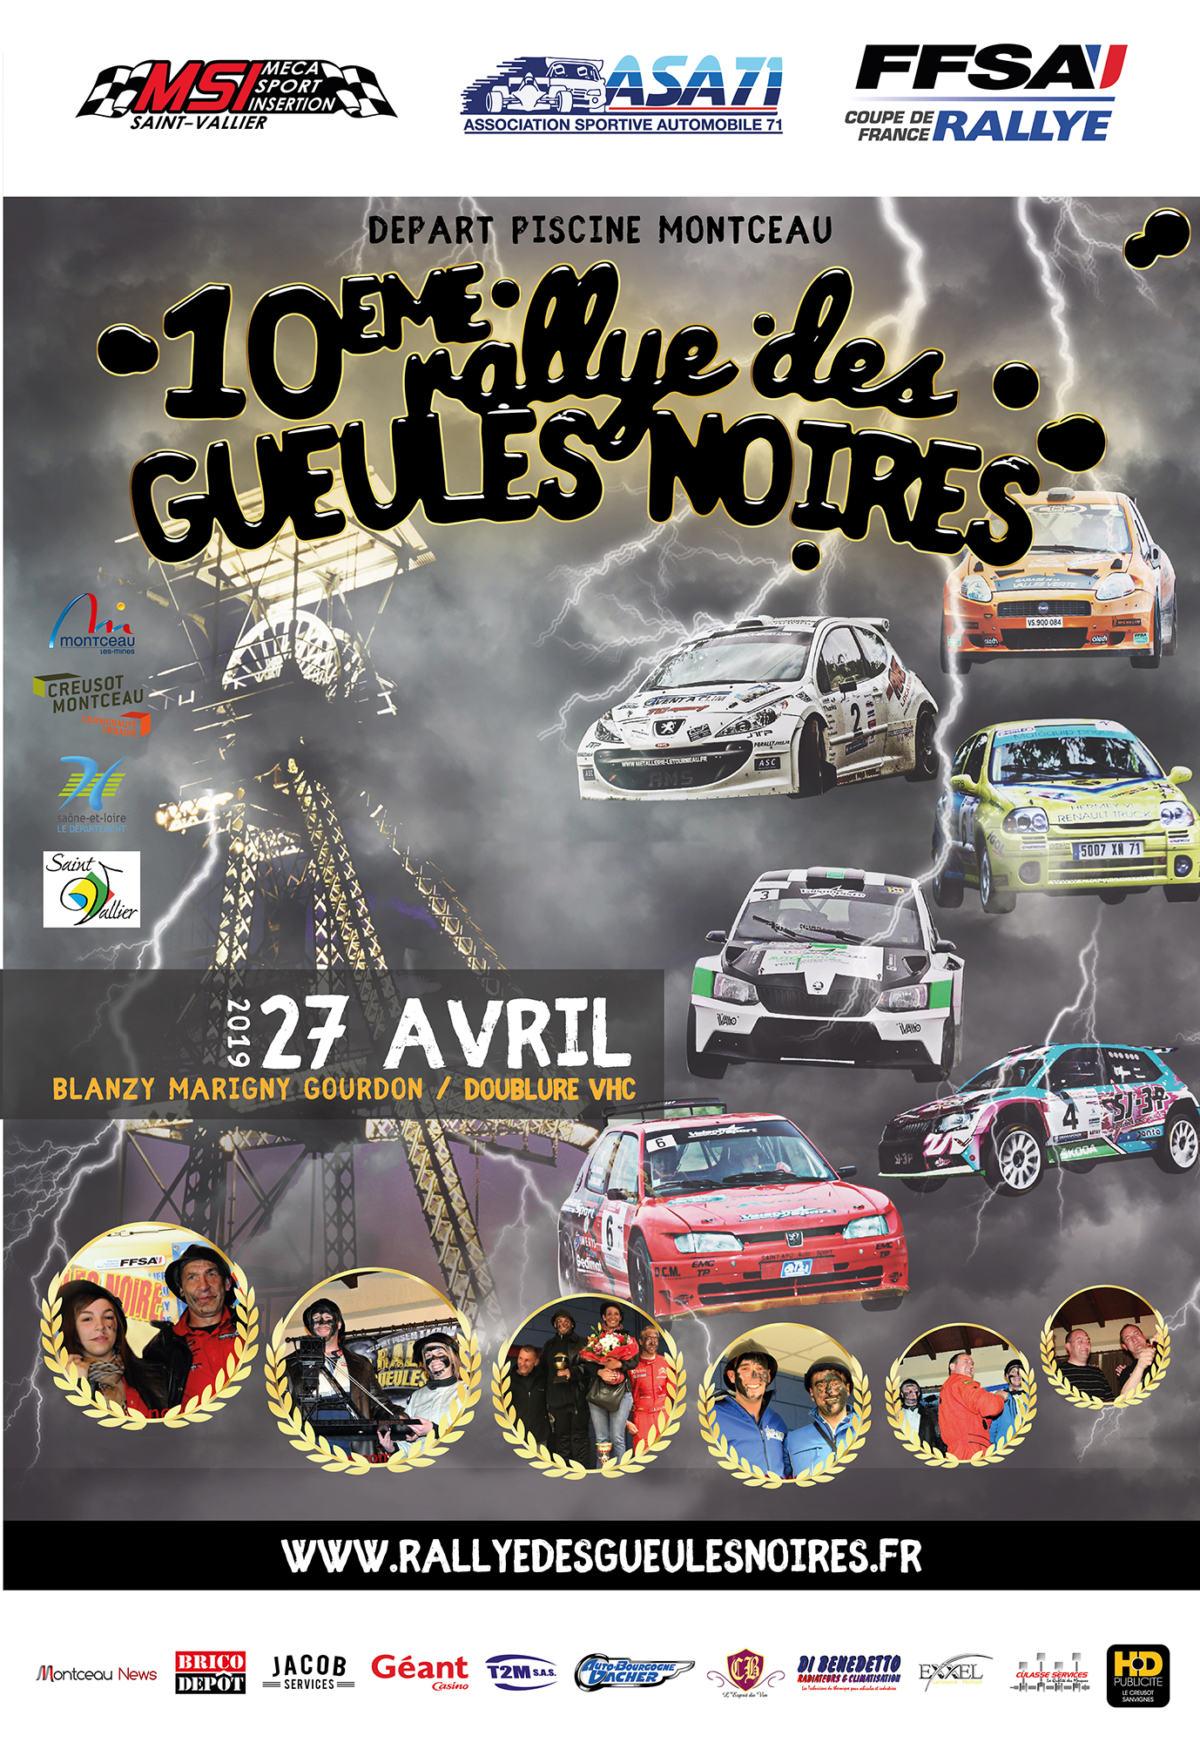 bat-banderole-affiche-rallye-msi-700x1020-02-2019.jpg